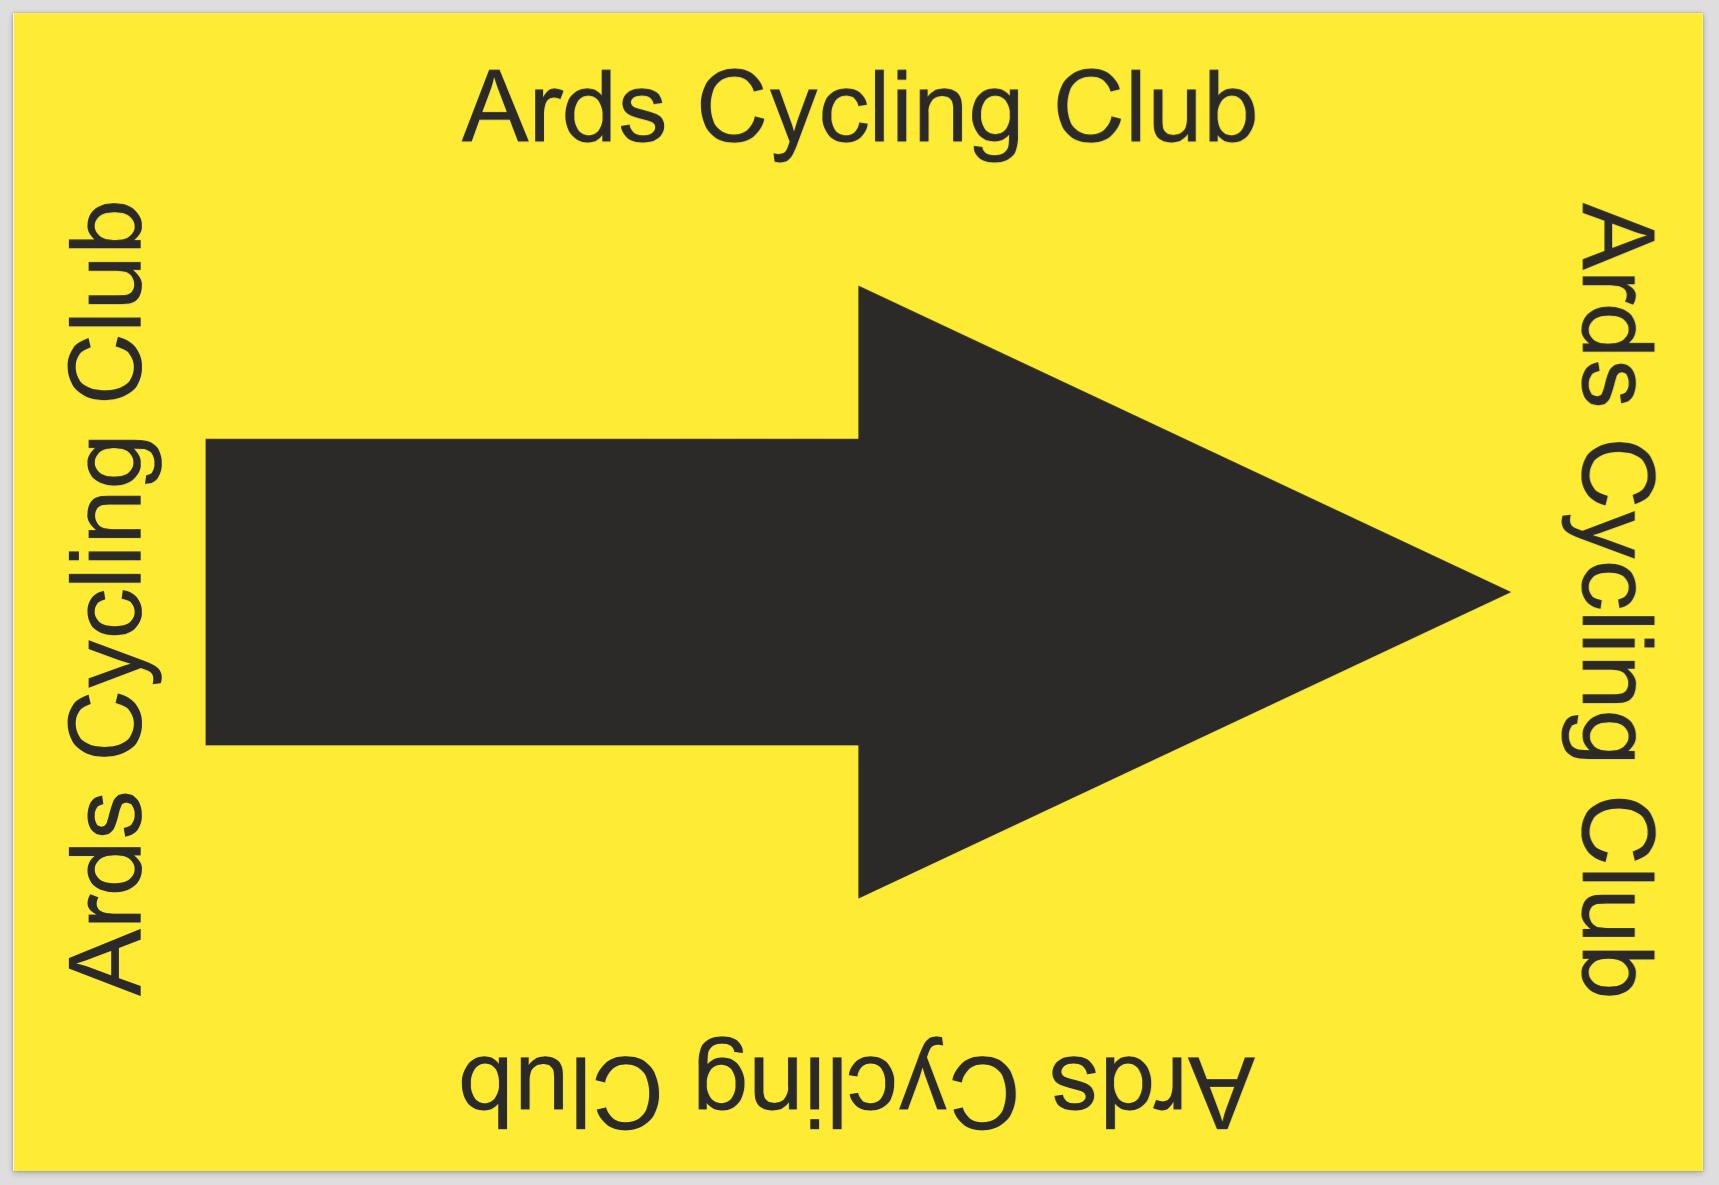 TOS Signage